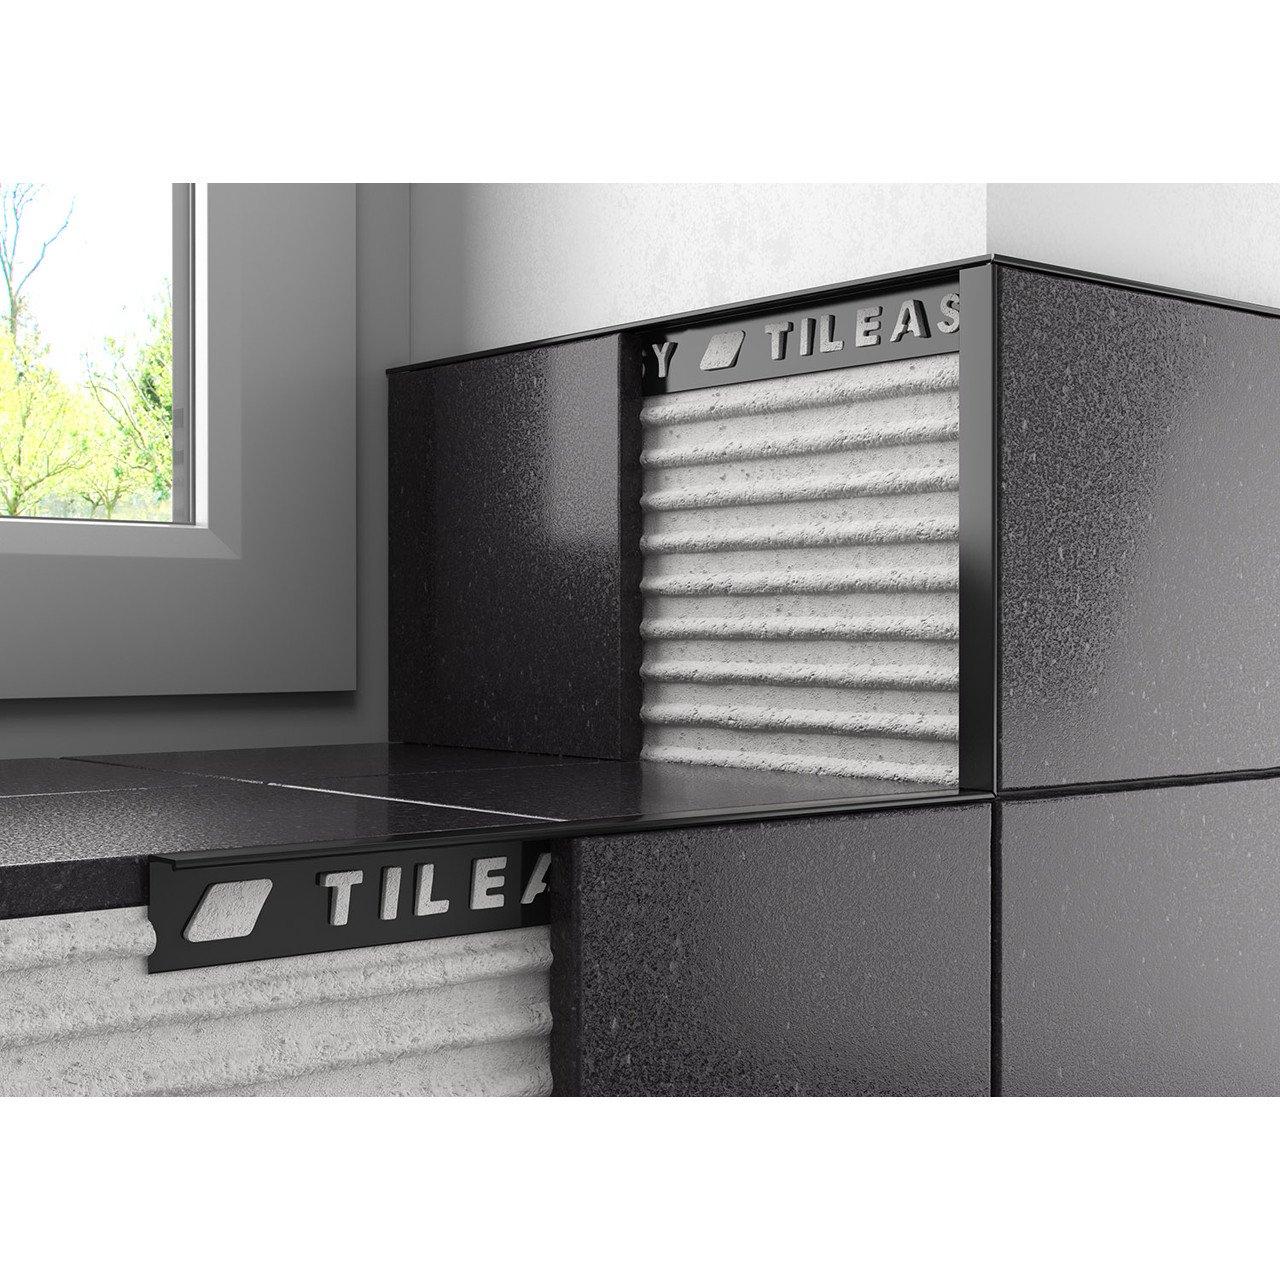 Tileasy 10mm Black Square Edge Metal Tile Trim Bat10 inside proportions 1280 X 1280